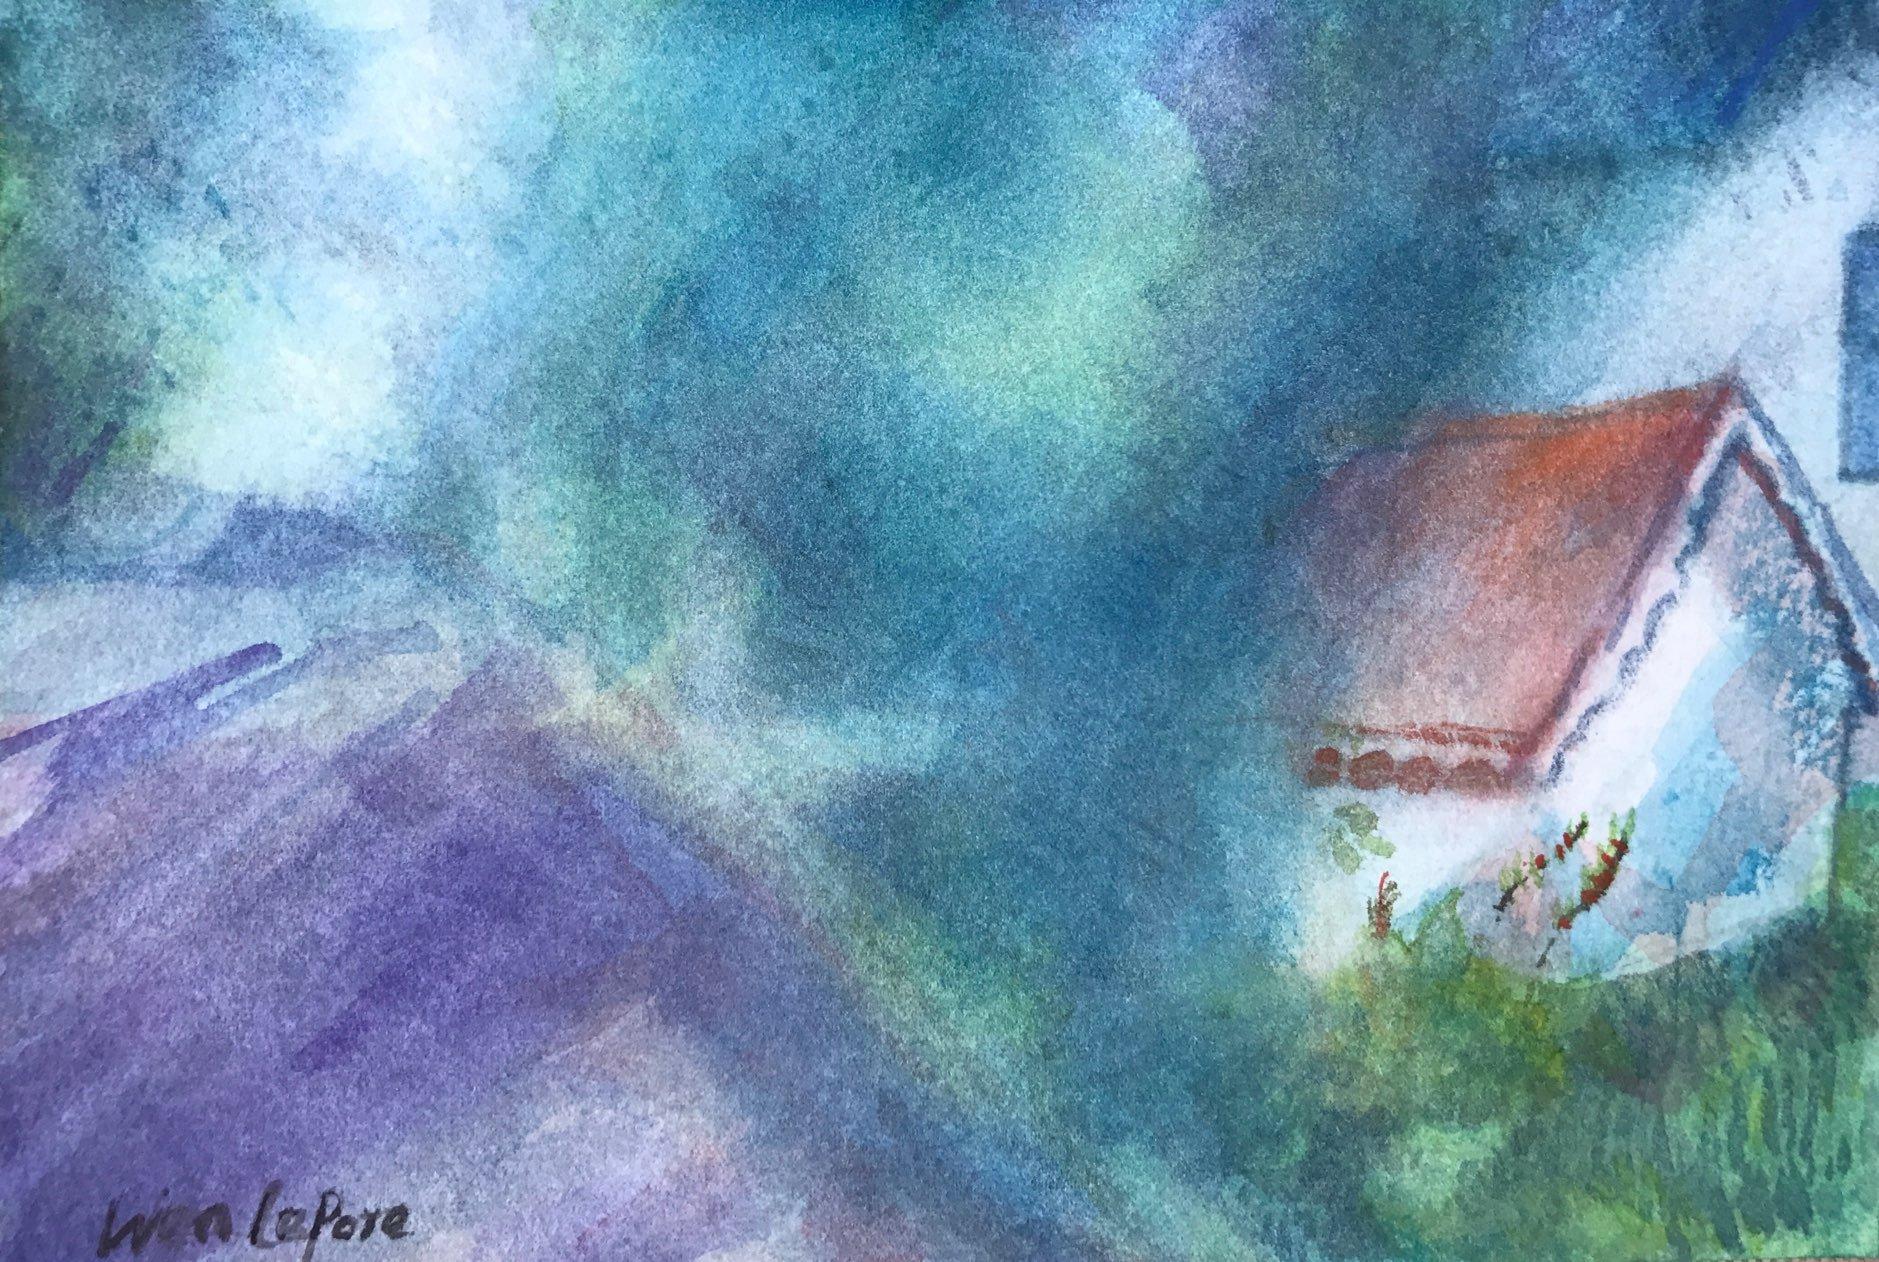 https://0901.nccdn.net/4_2/000/000/008/486/watercolor29.jpg